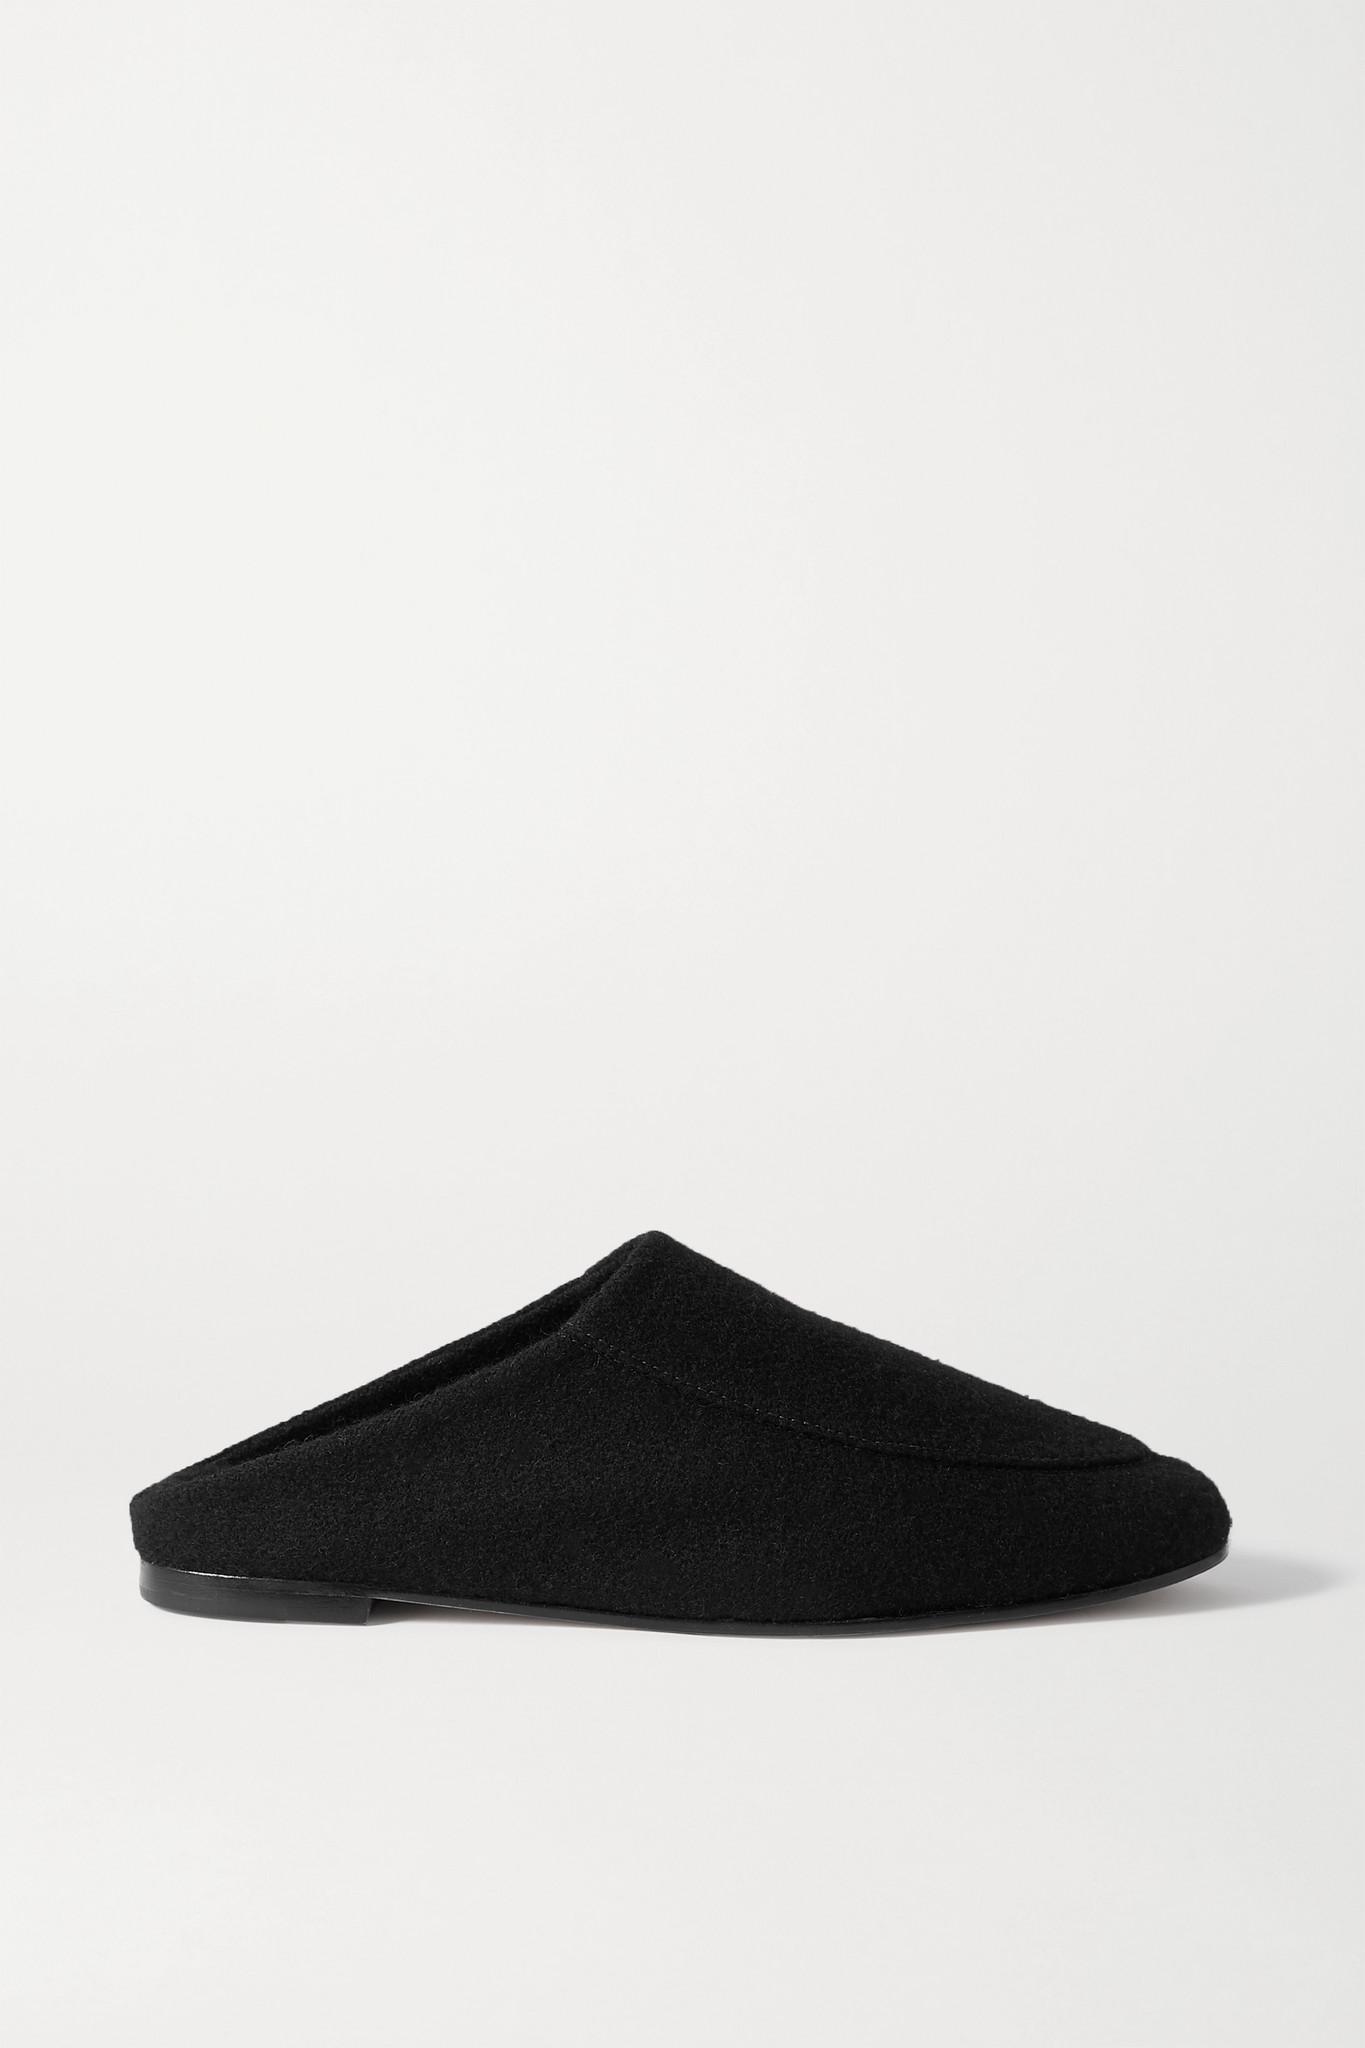 PORTE & PAIRE - 羊毛皮衬里毛毡拖鞋 - 黑色 - IT39.5